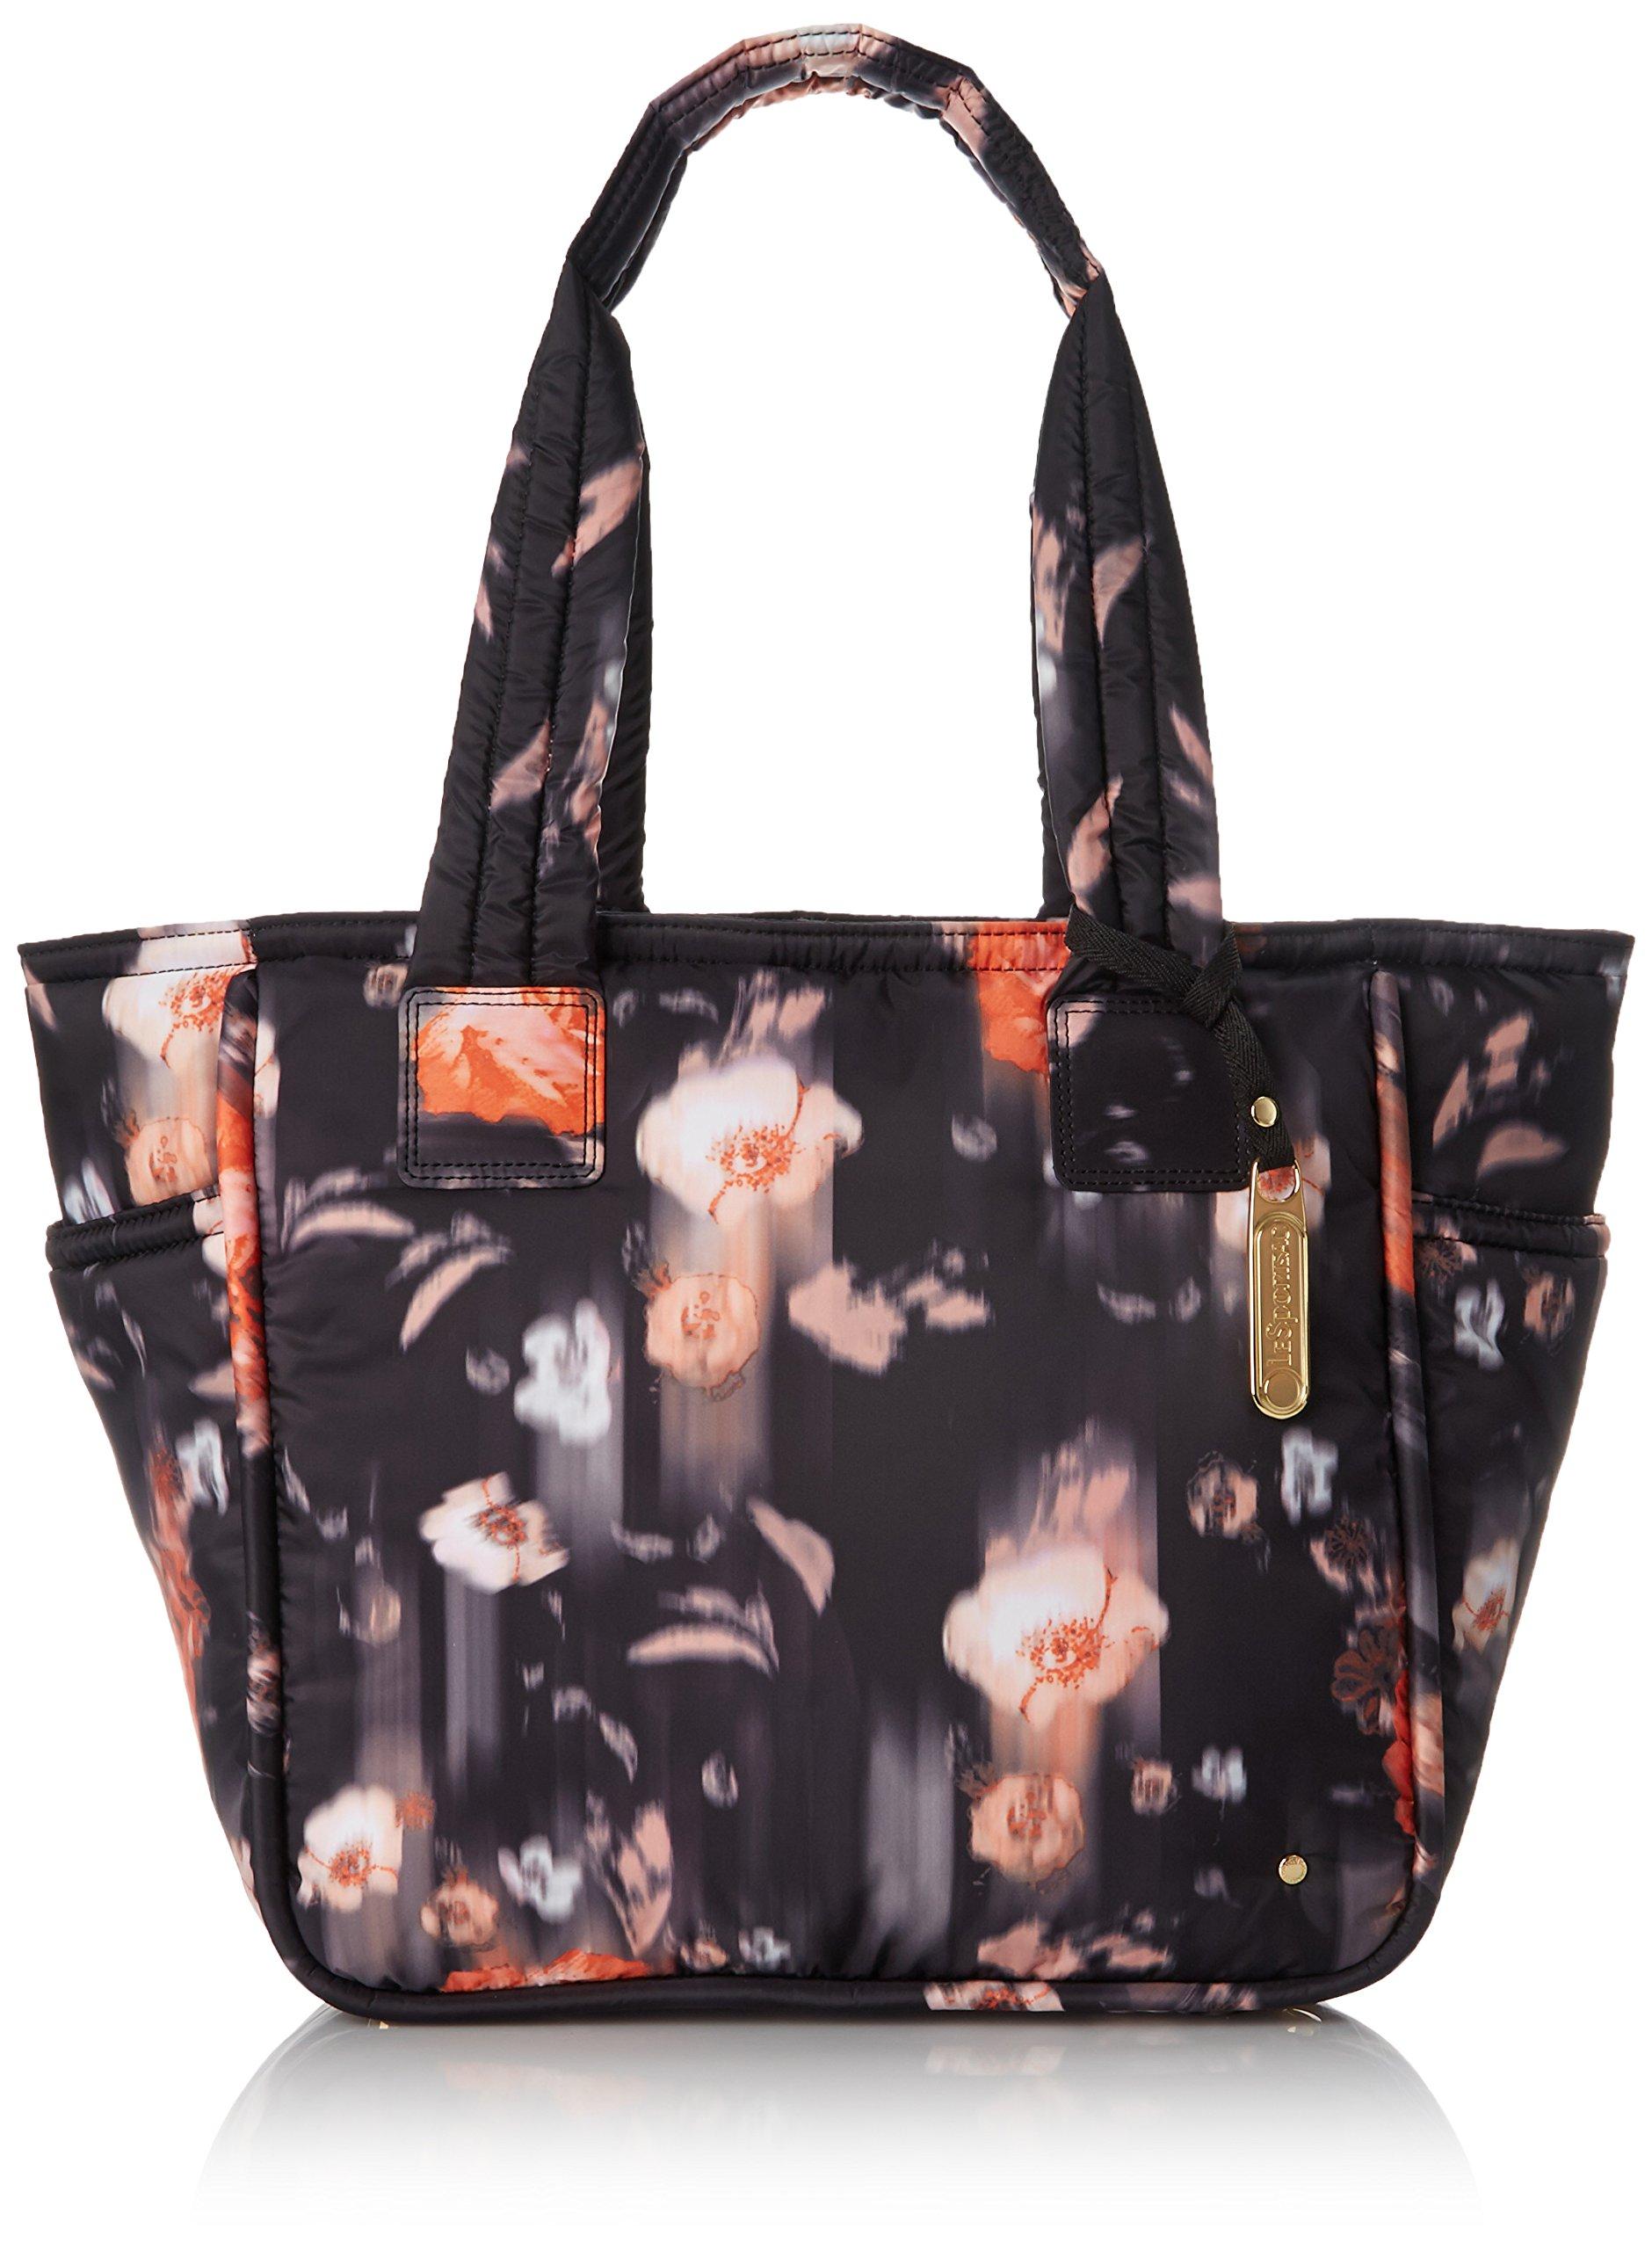 LeSportsac Signature Claudia Tote Bag, Damask Rose, One Size by LeSportsac